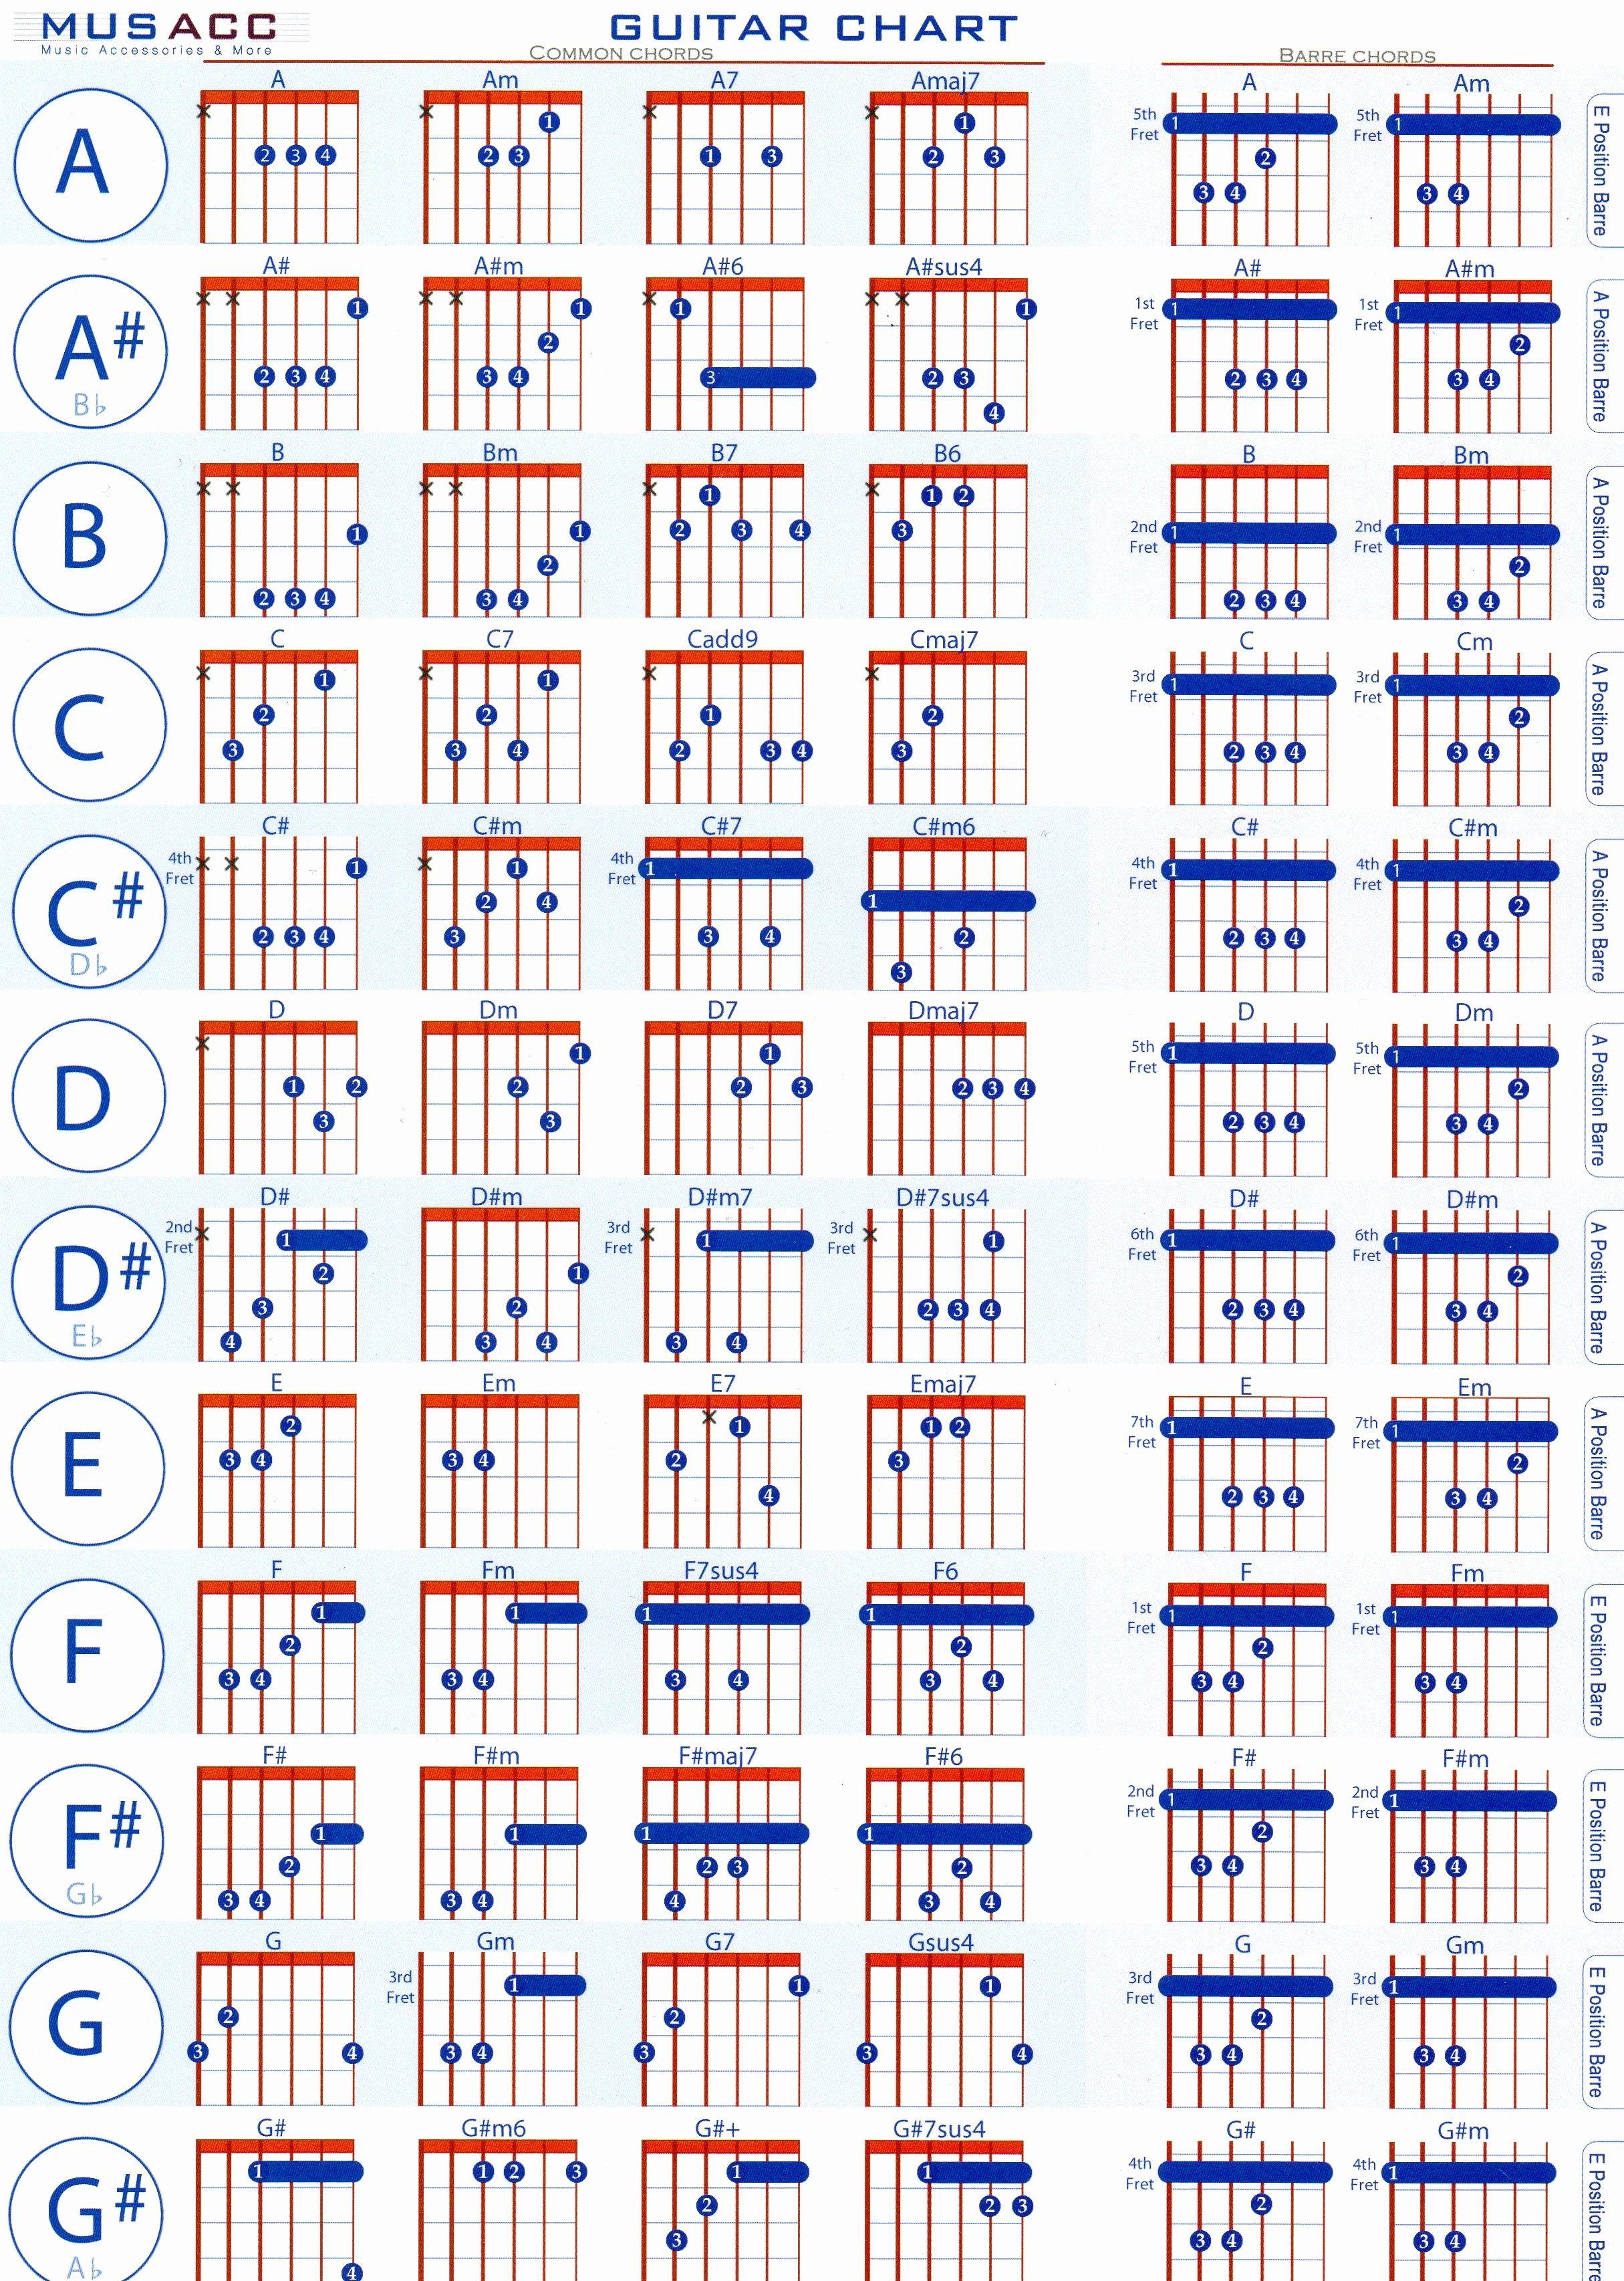 Guitar Bar Chords Chart Pdf Physic Minimalistics Guitar Chord Chart Guitar Chords Piano Chords Chart